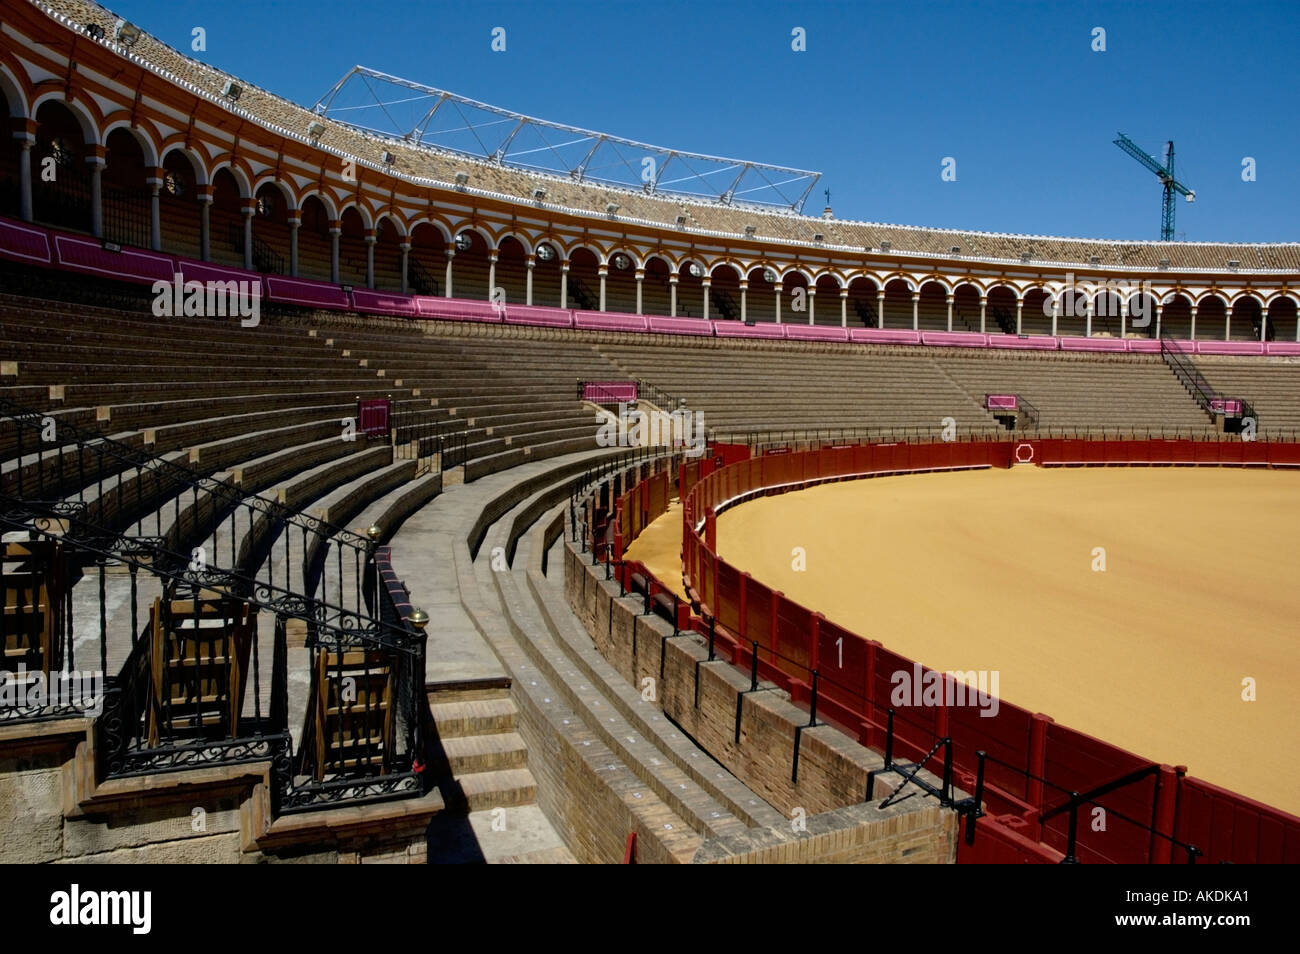 Bullring, Spain - Plaza de Toros de la Real Maestranza de Caballeria de Sevilla, Spain's oldest bullring arena, Seville, Spain - Stock Image